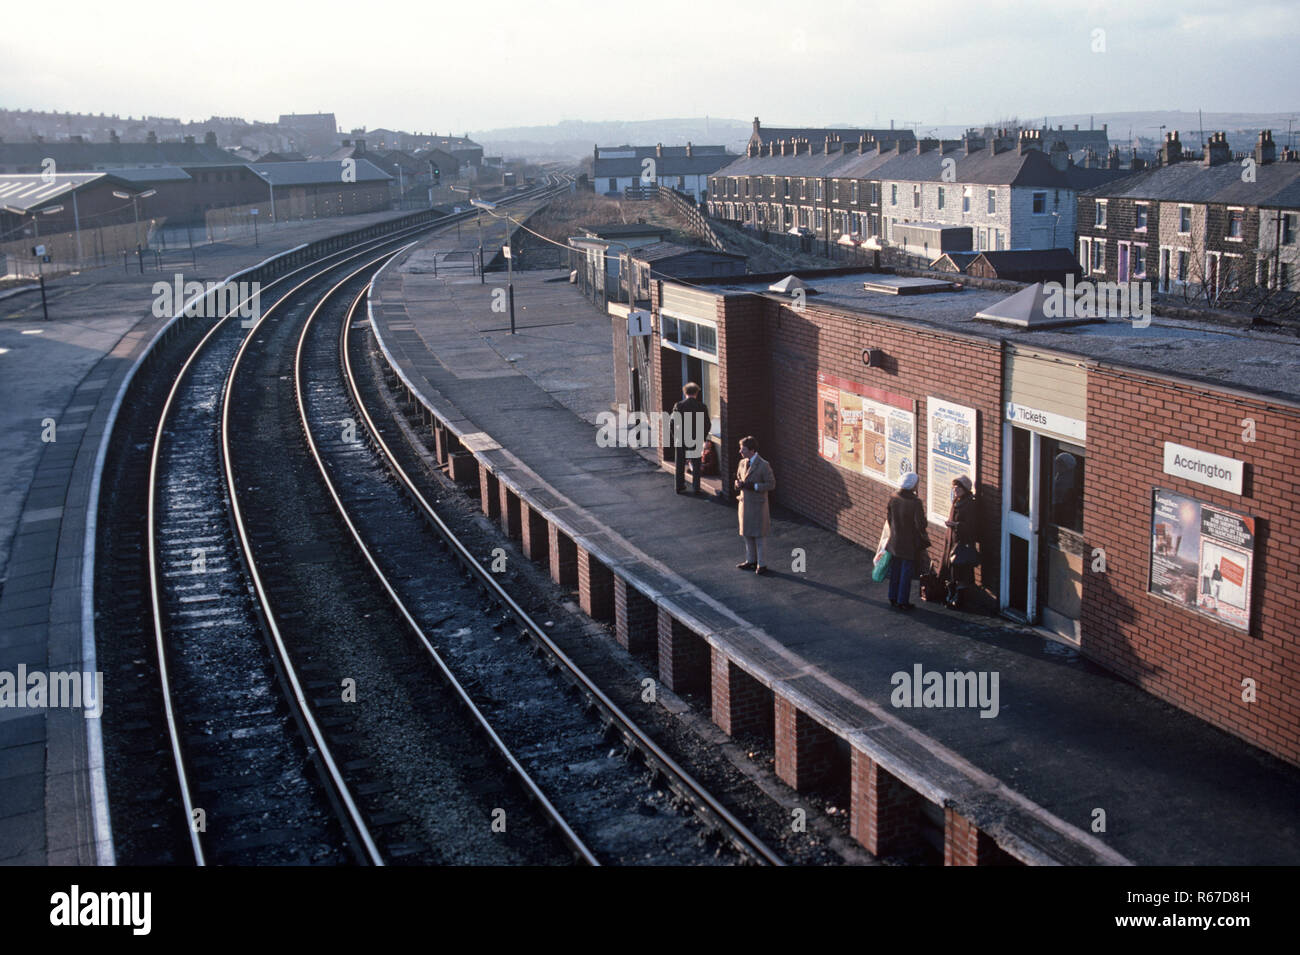 Accrington station on the British Rail Preston to Colne railway line, Lancashire, Great Britain - Stock Image